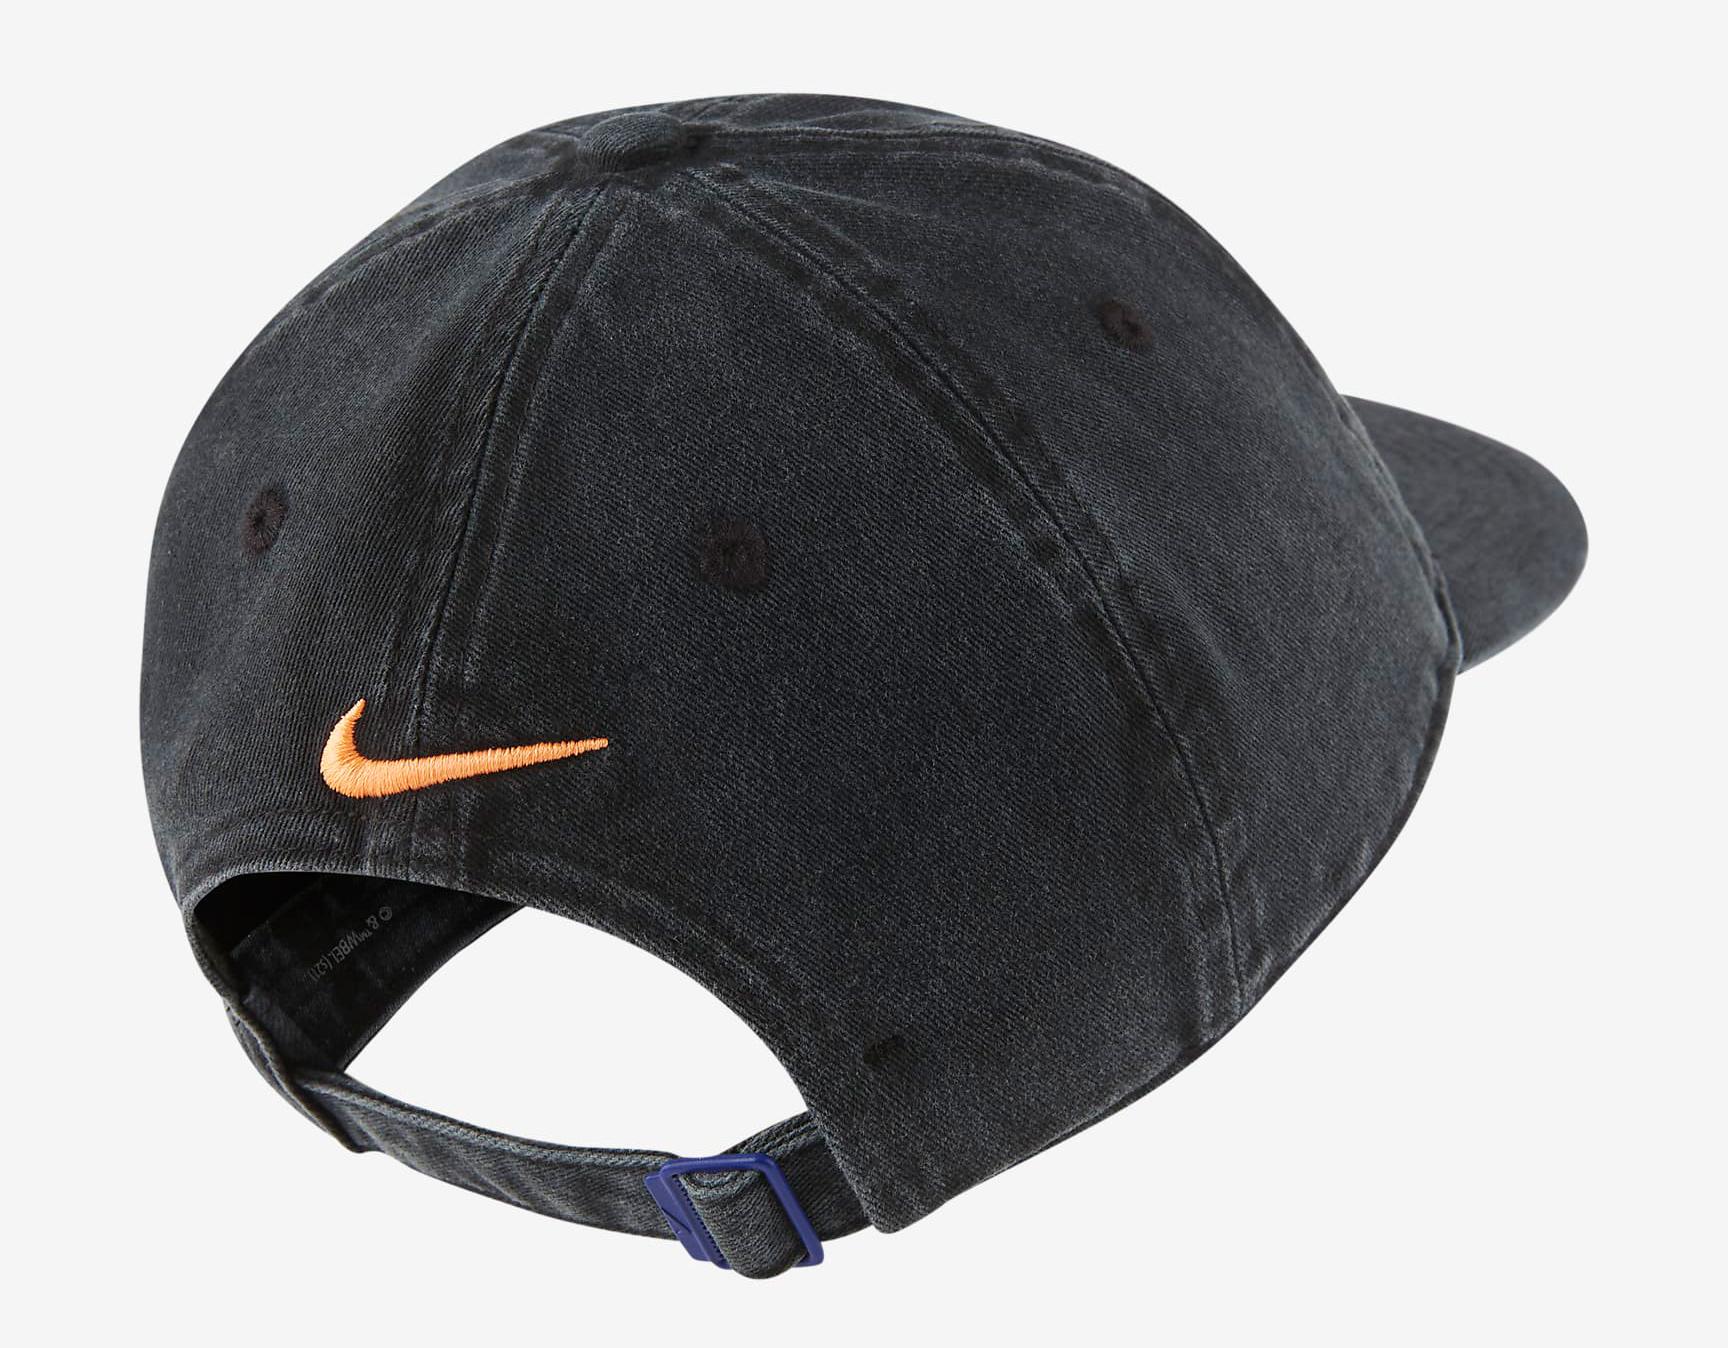 nike-lebron-space-jam-tune-squad-hat-2